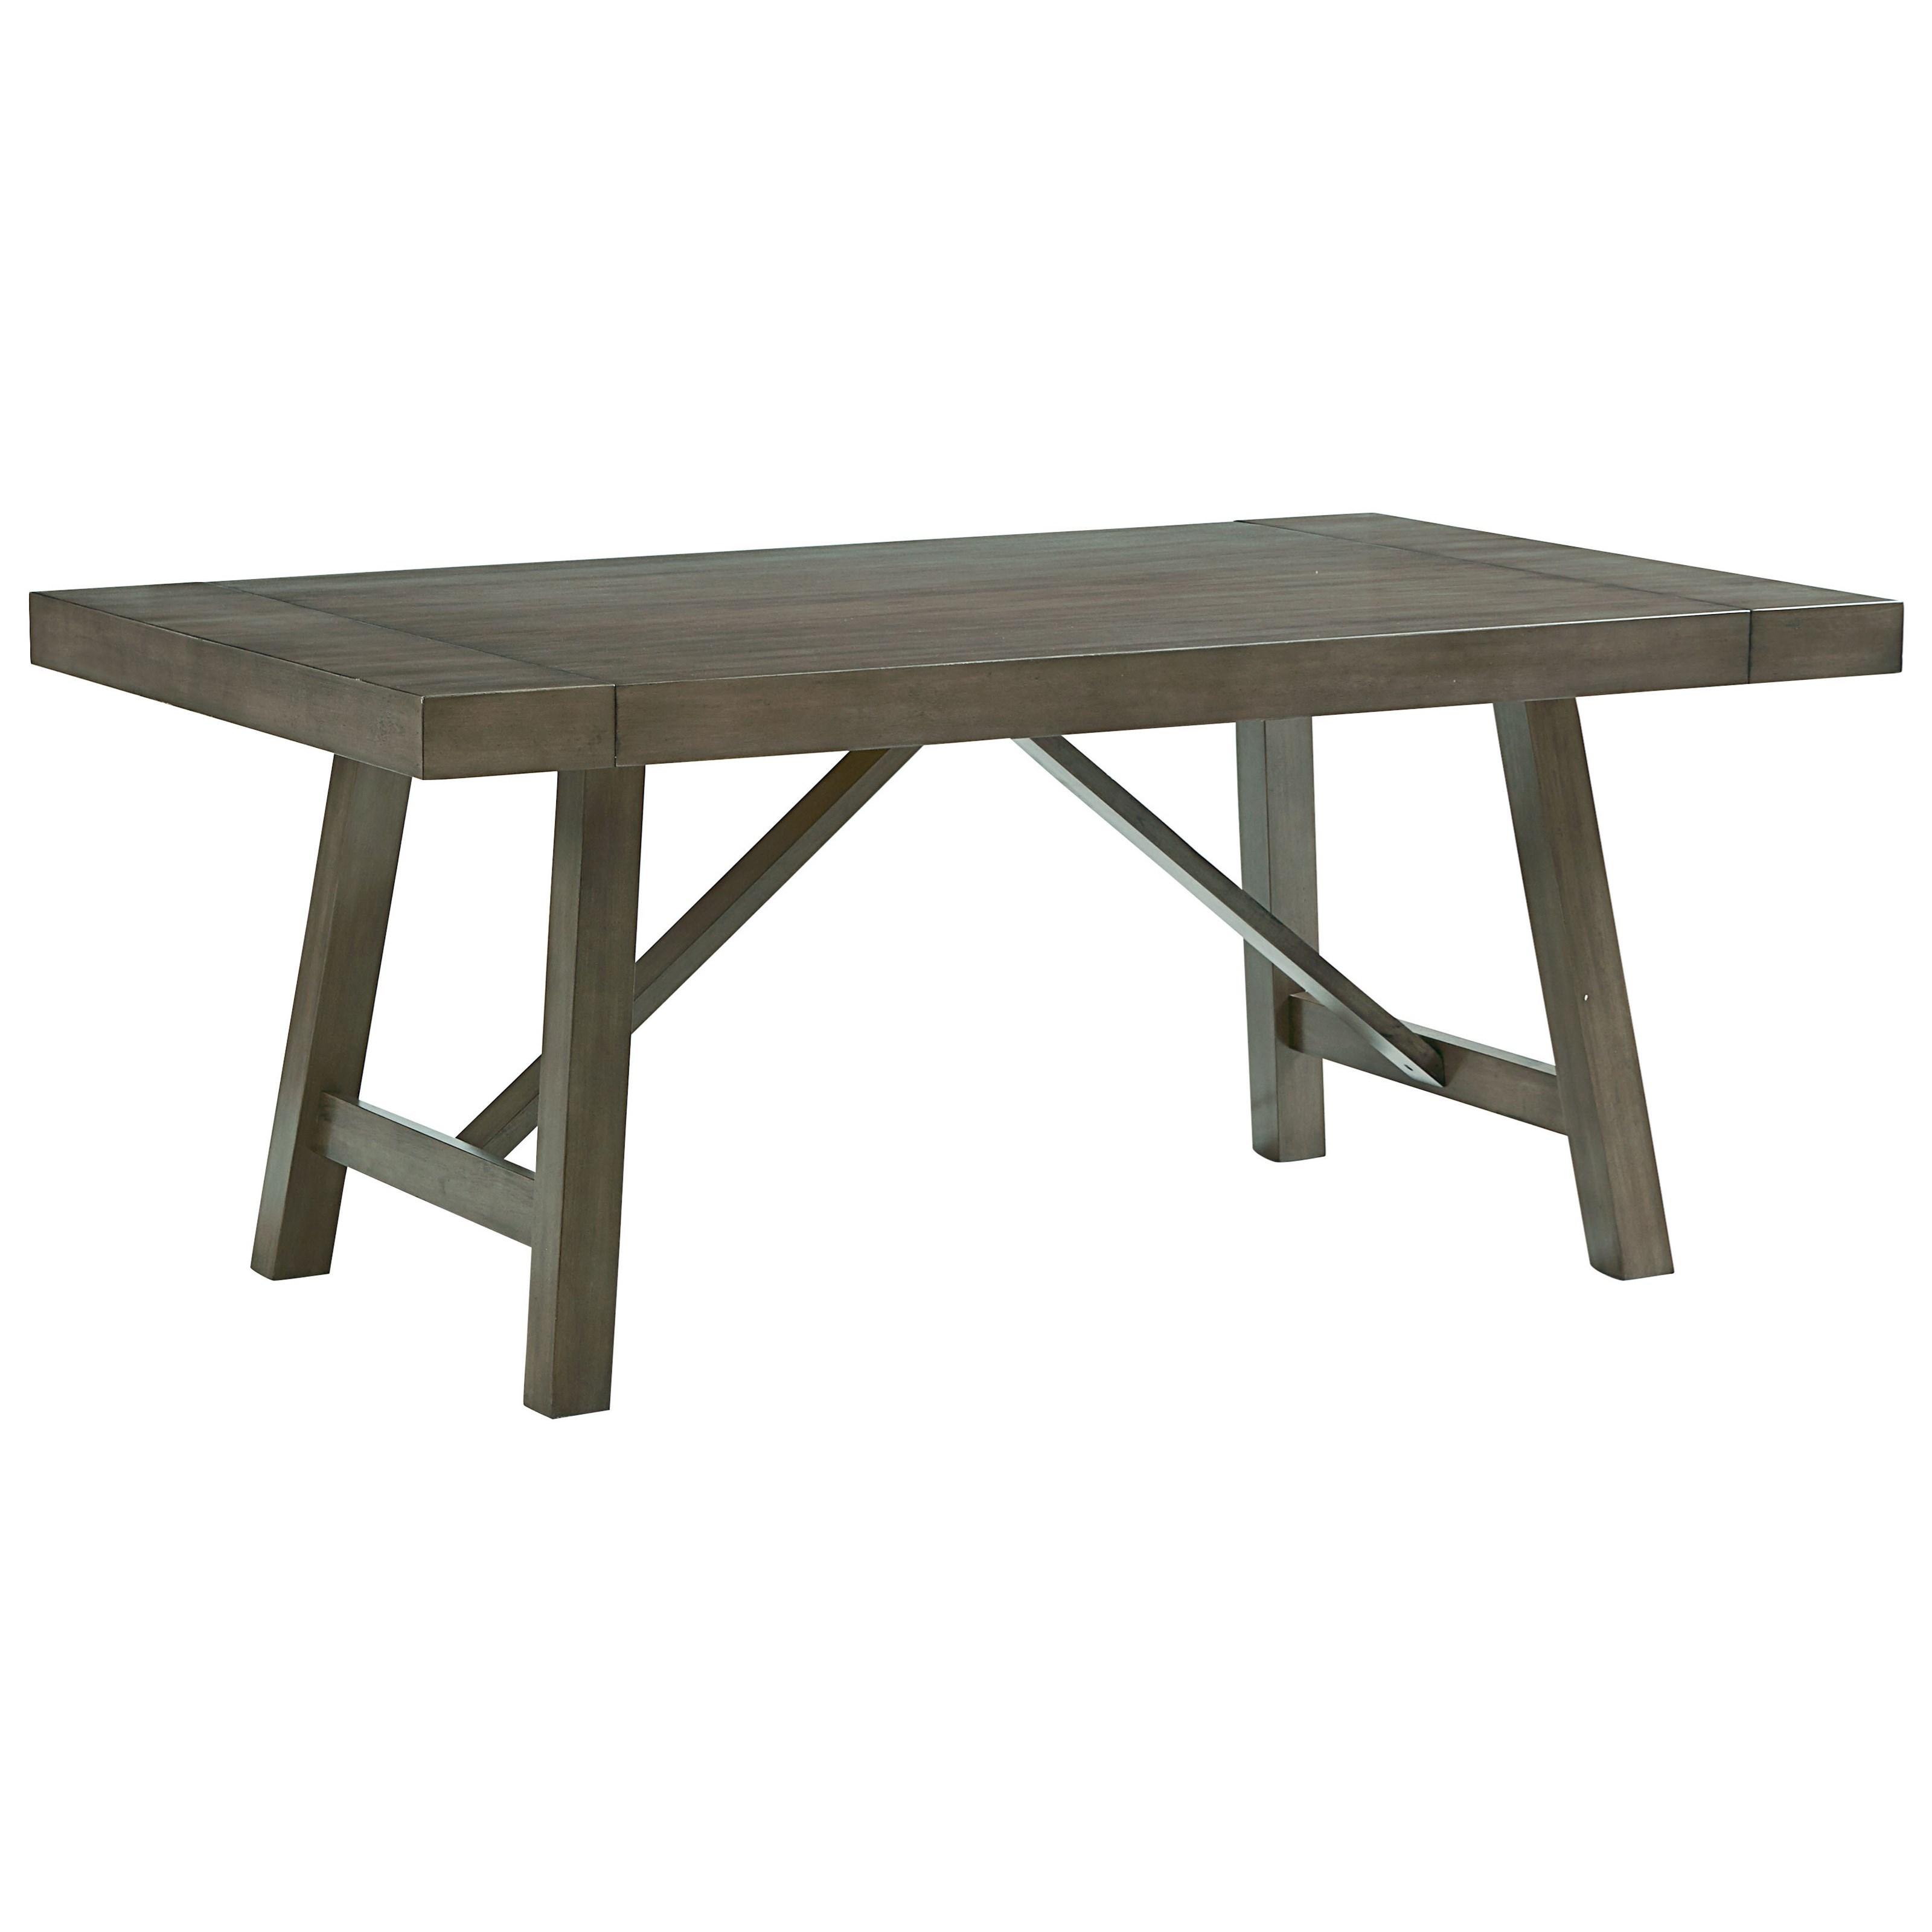 Trestle Dining Room Table: Standard Furniture Omaha Grey Trestle Dining Room Table